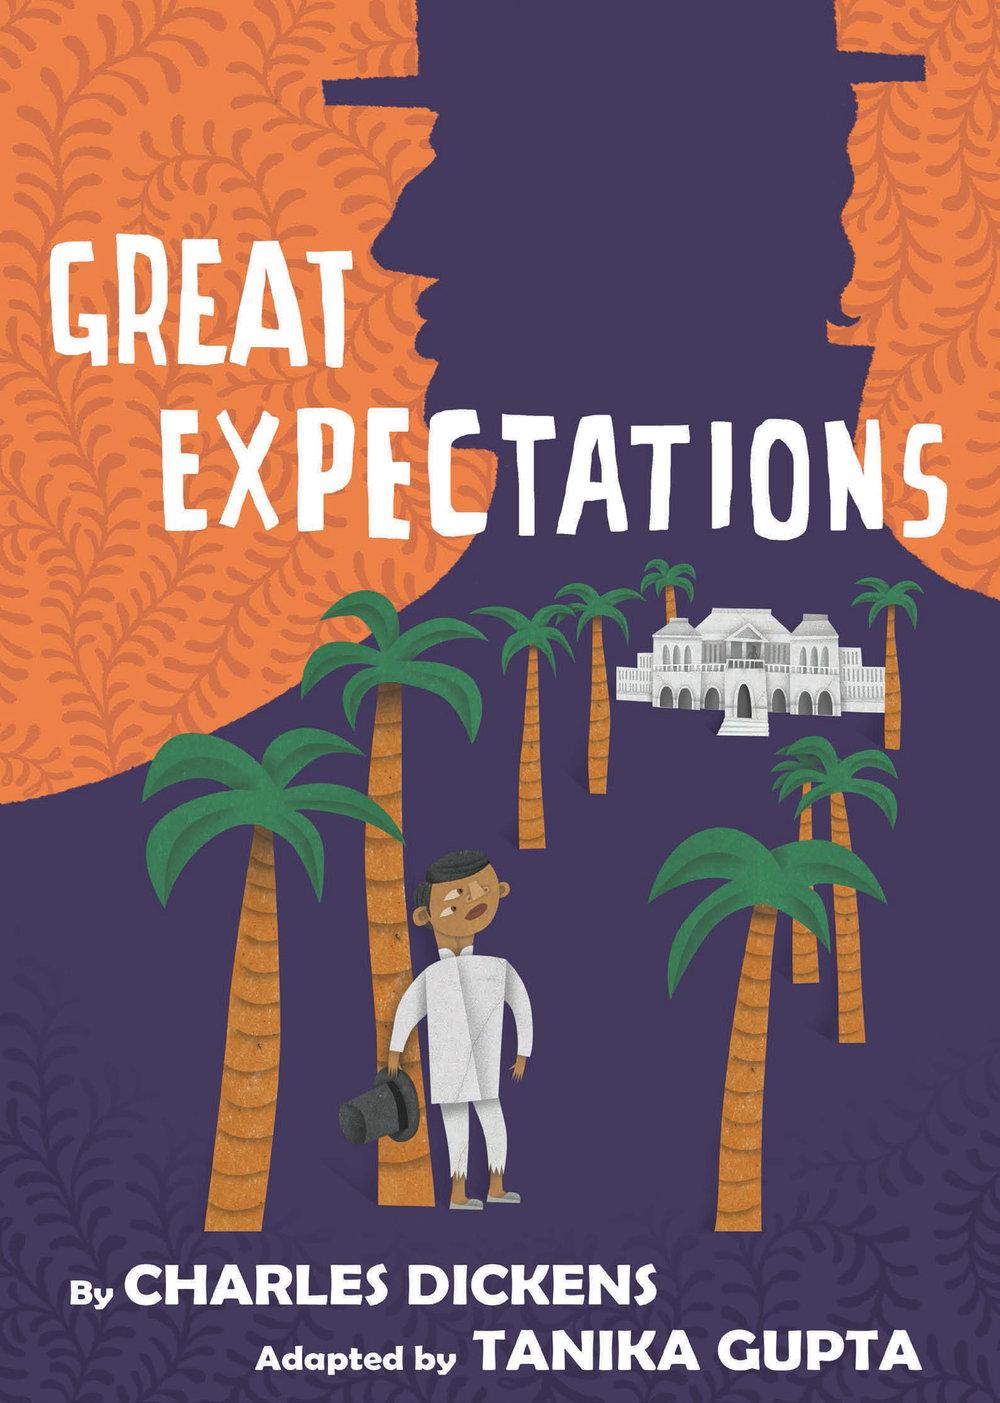 GreatExpectations.jpg